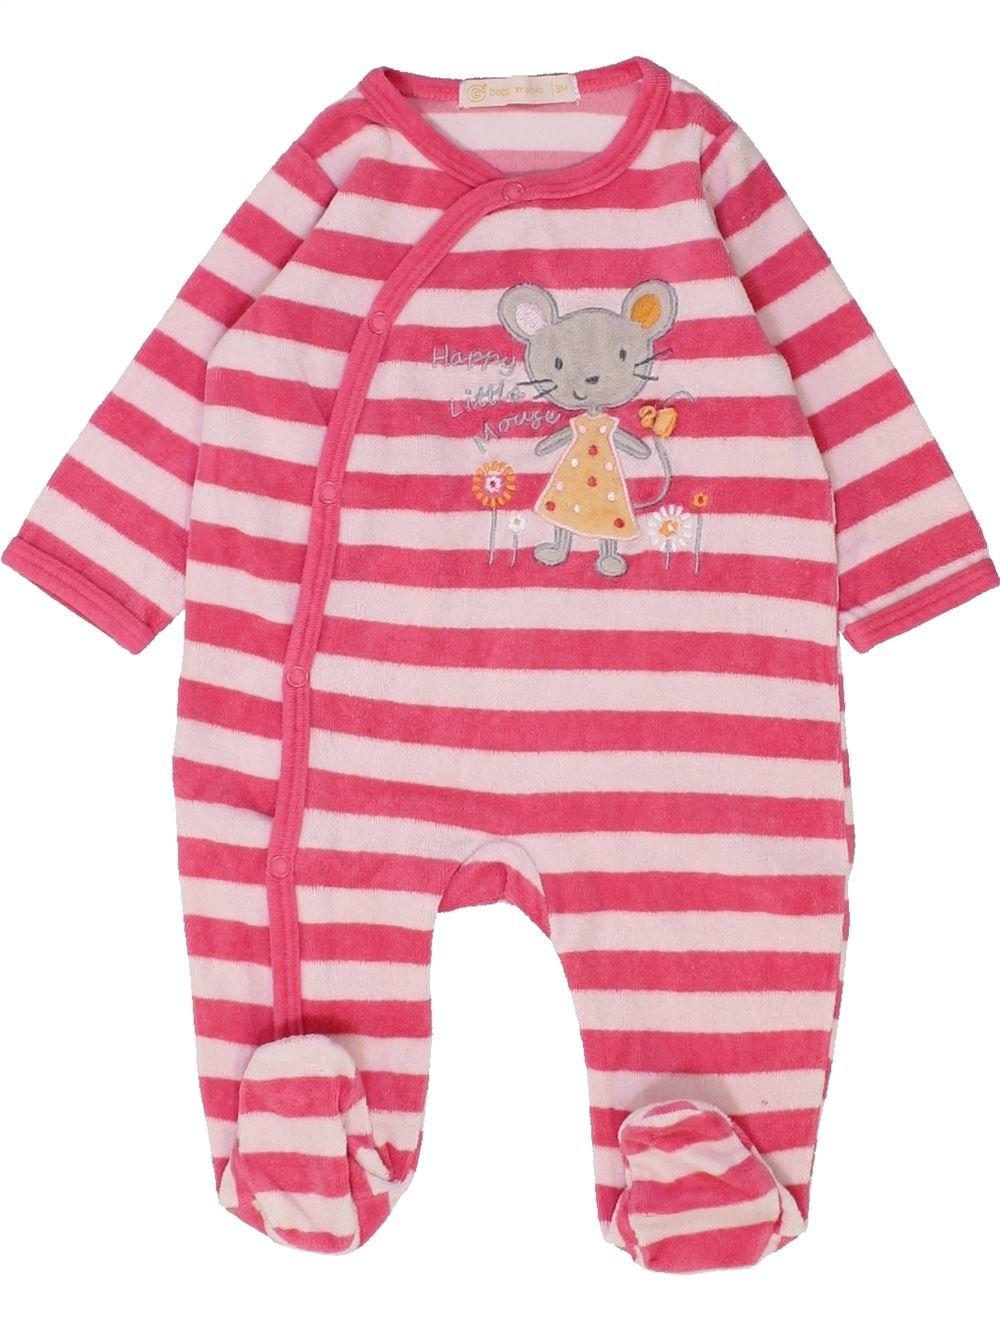 857fbe84be236 Pyjama 1 piece rose GEMO du 3 mois pour Fille - 1449335